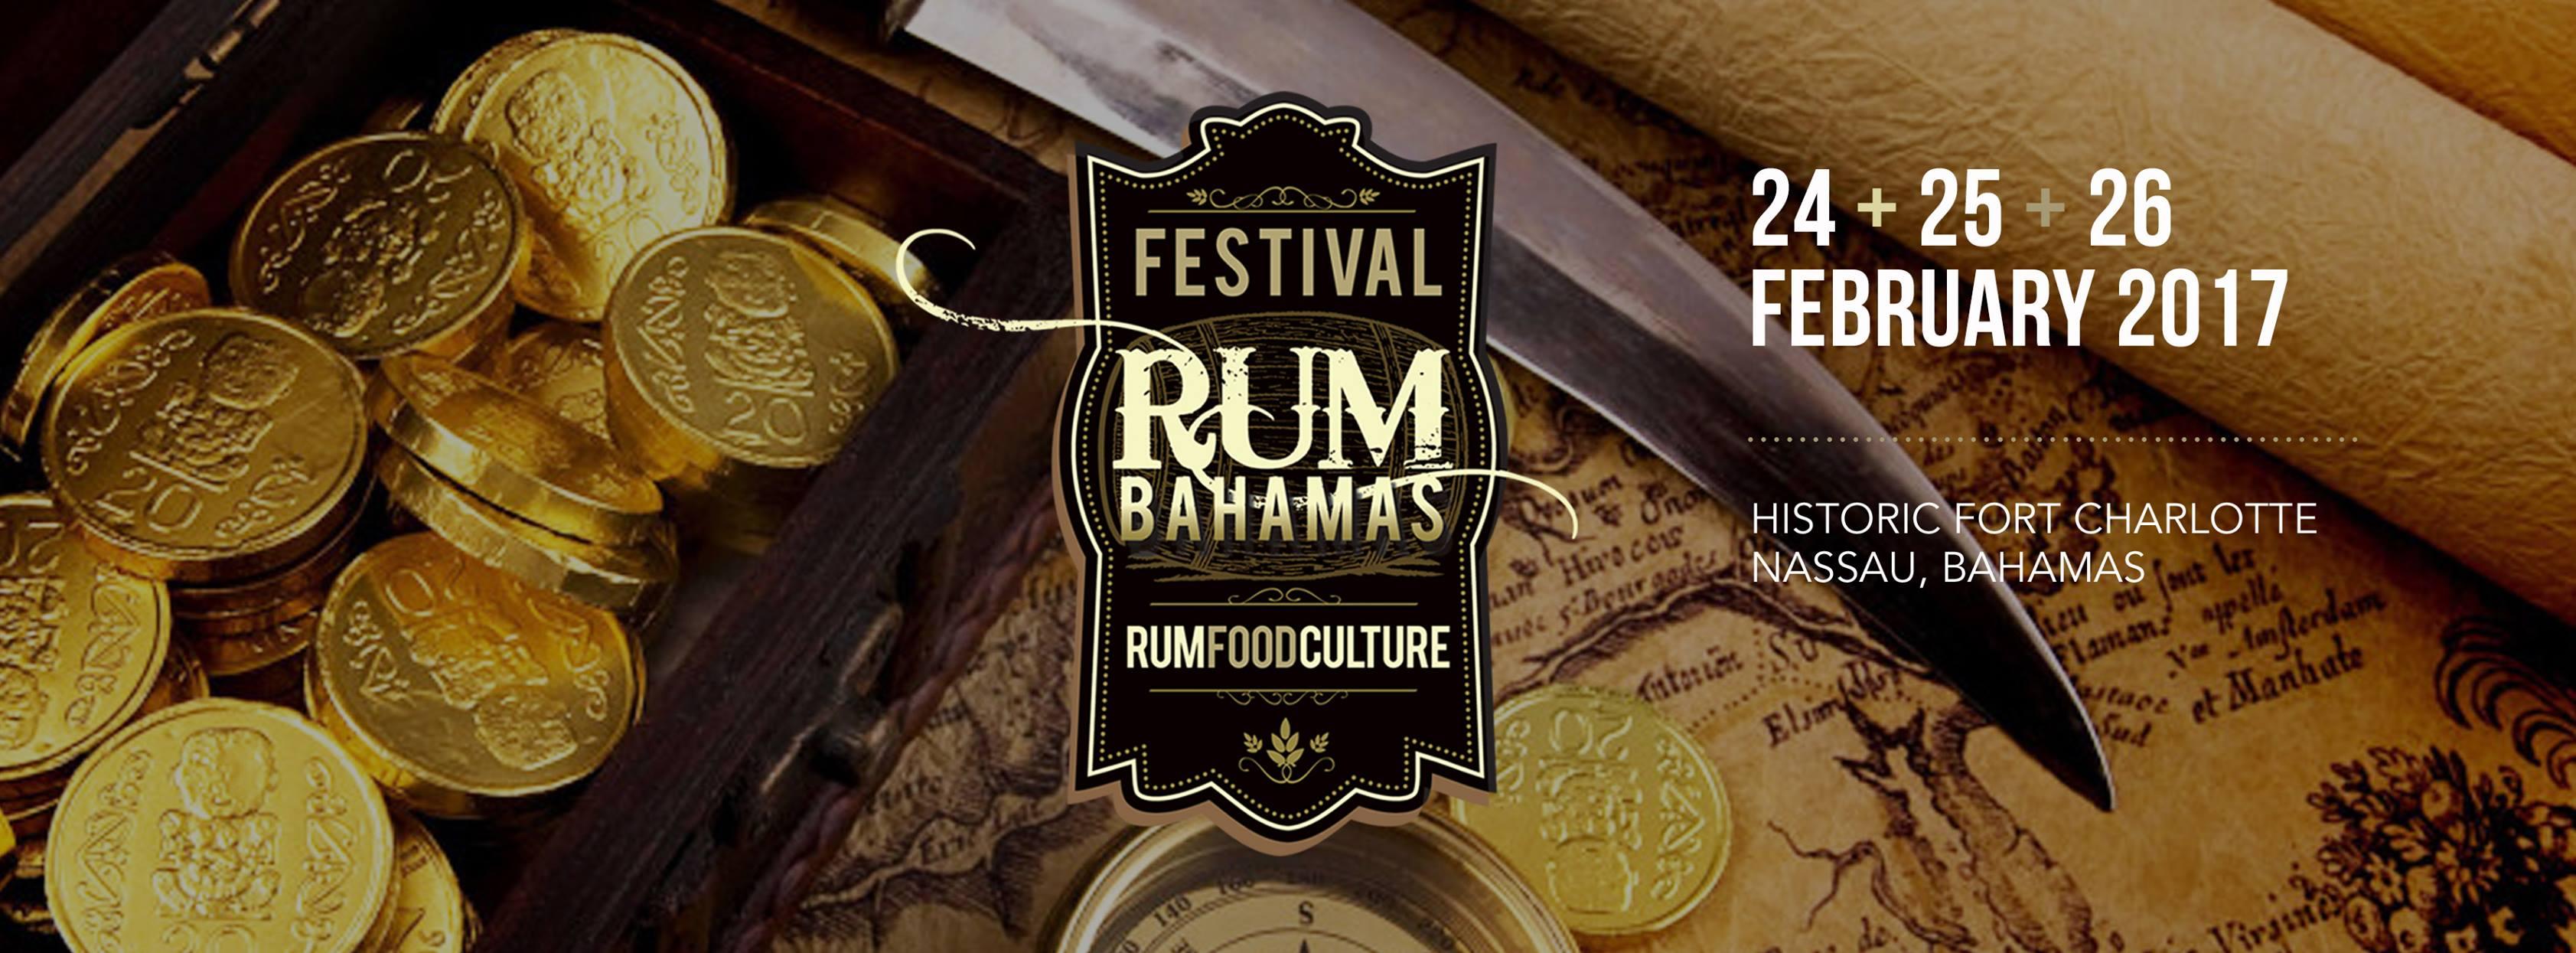 Festival Rum Bahamas 2017